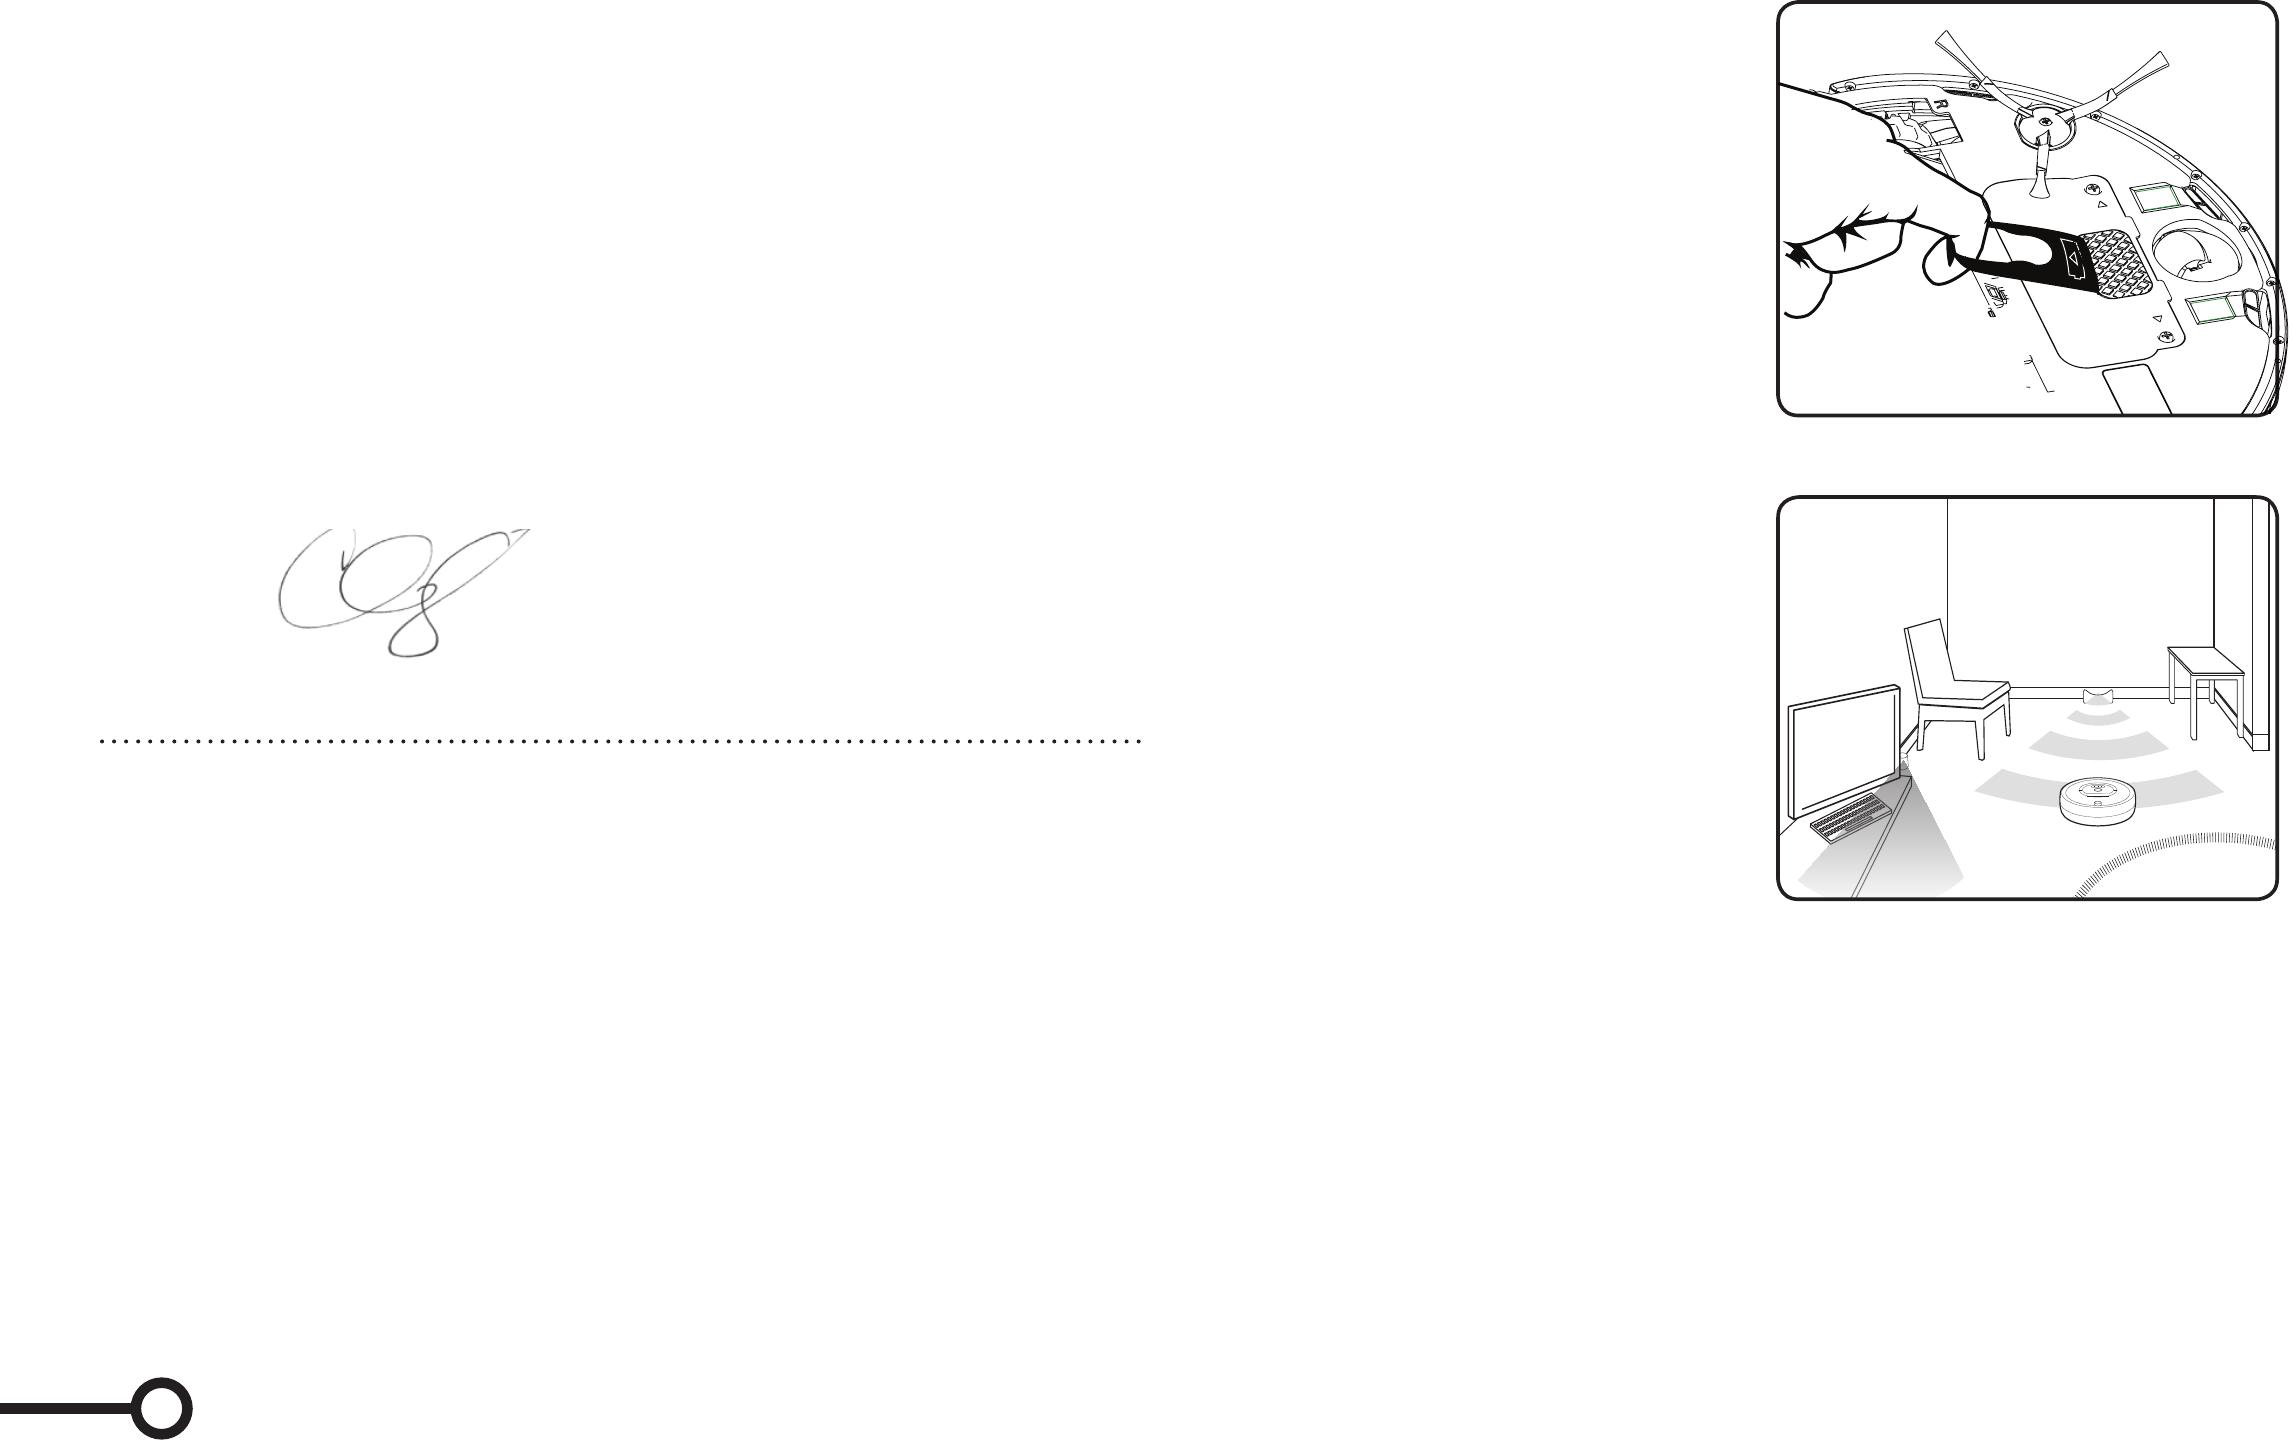 Irobot Roomba 770 Users Manual